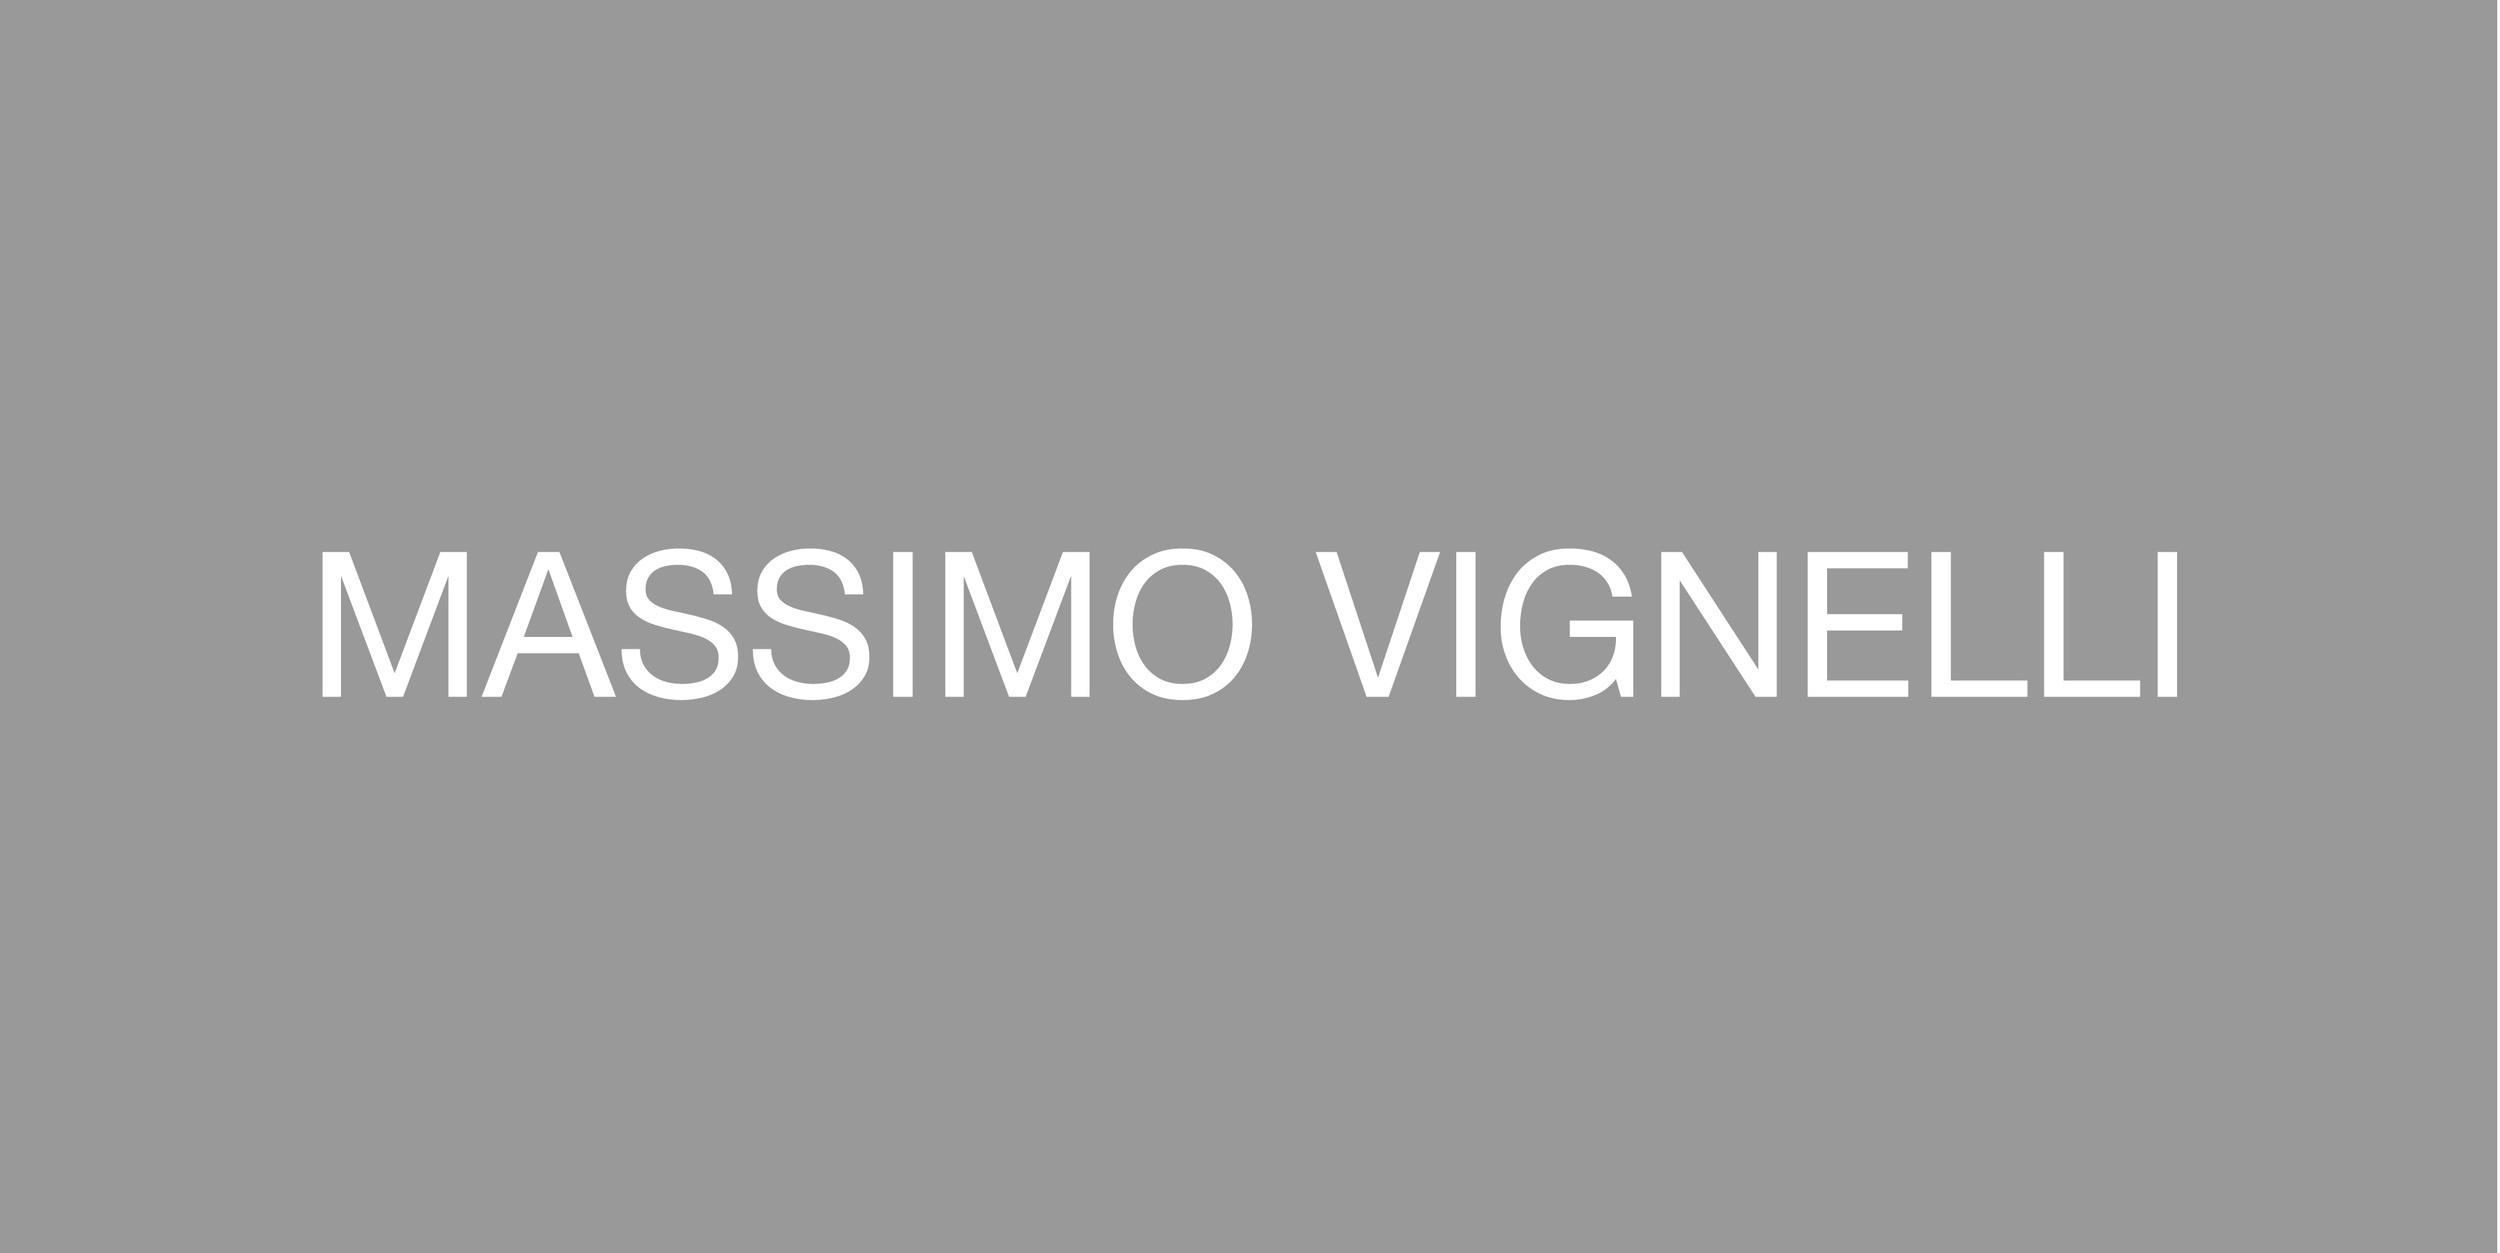 FTM_Massimo Vignelli.jpg